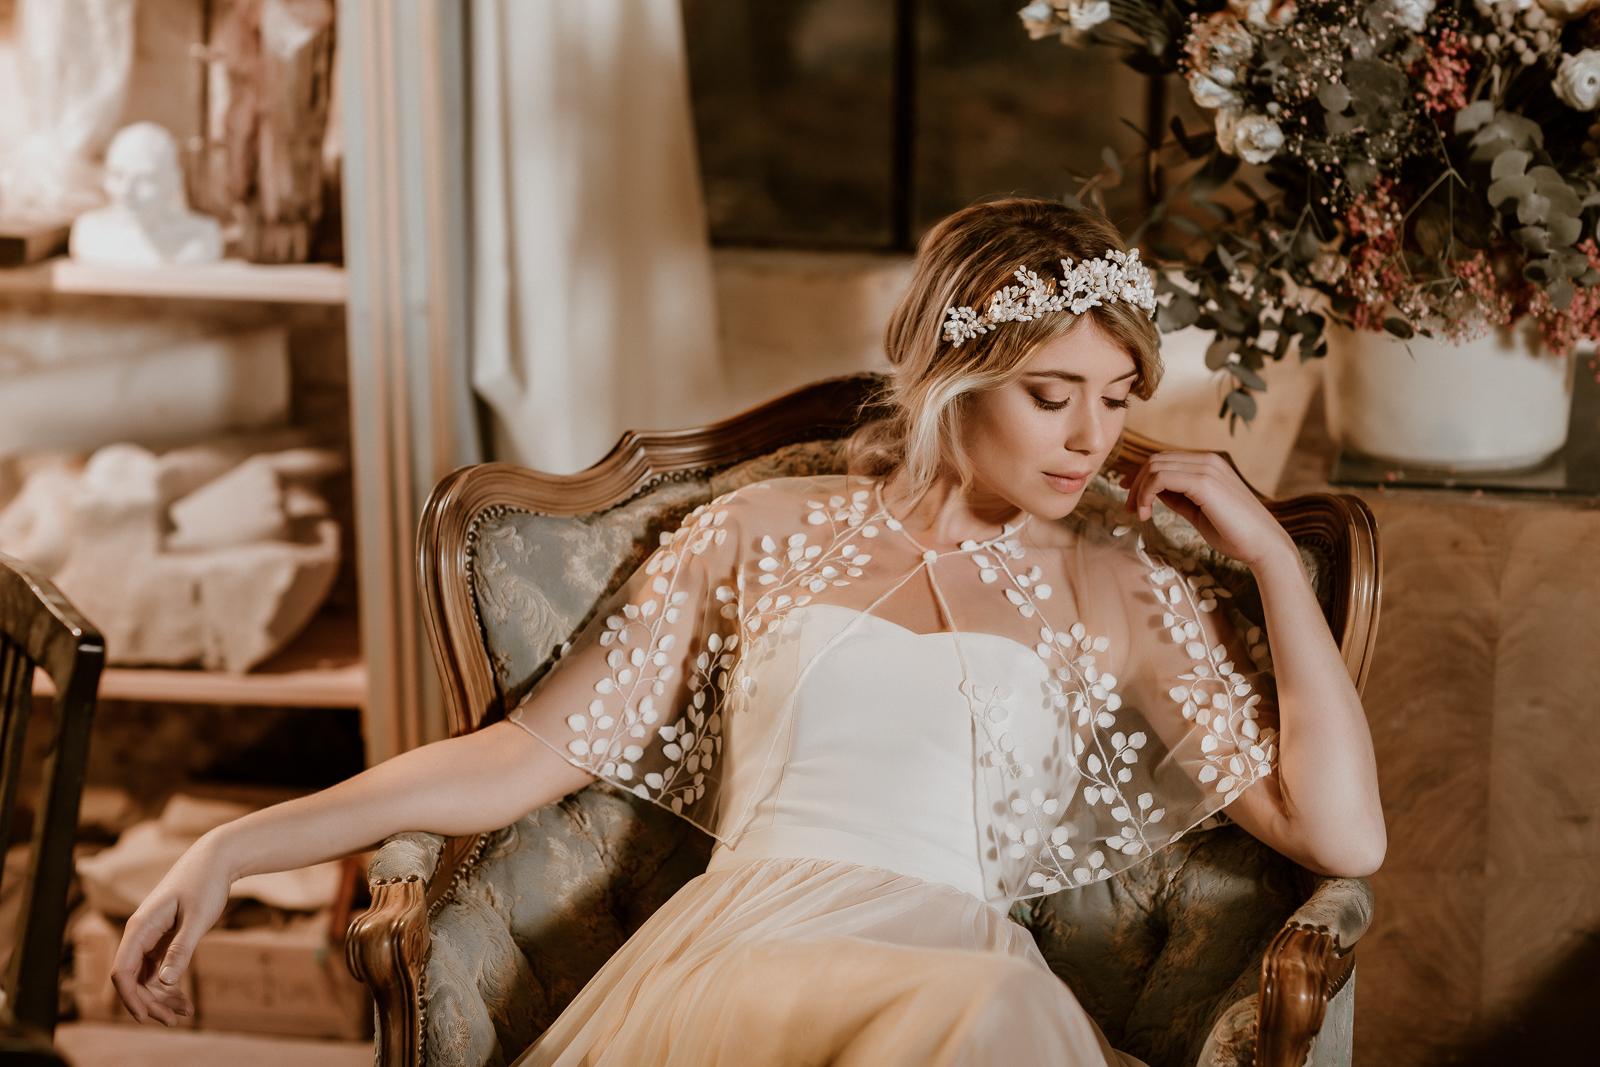 noni Jubiläumskollektion | Transparentes Brautcape aus feiner Spitze mit zarten 3D-Blüten, Modell sitzend (Foto: Le Hai Linh)